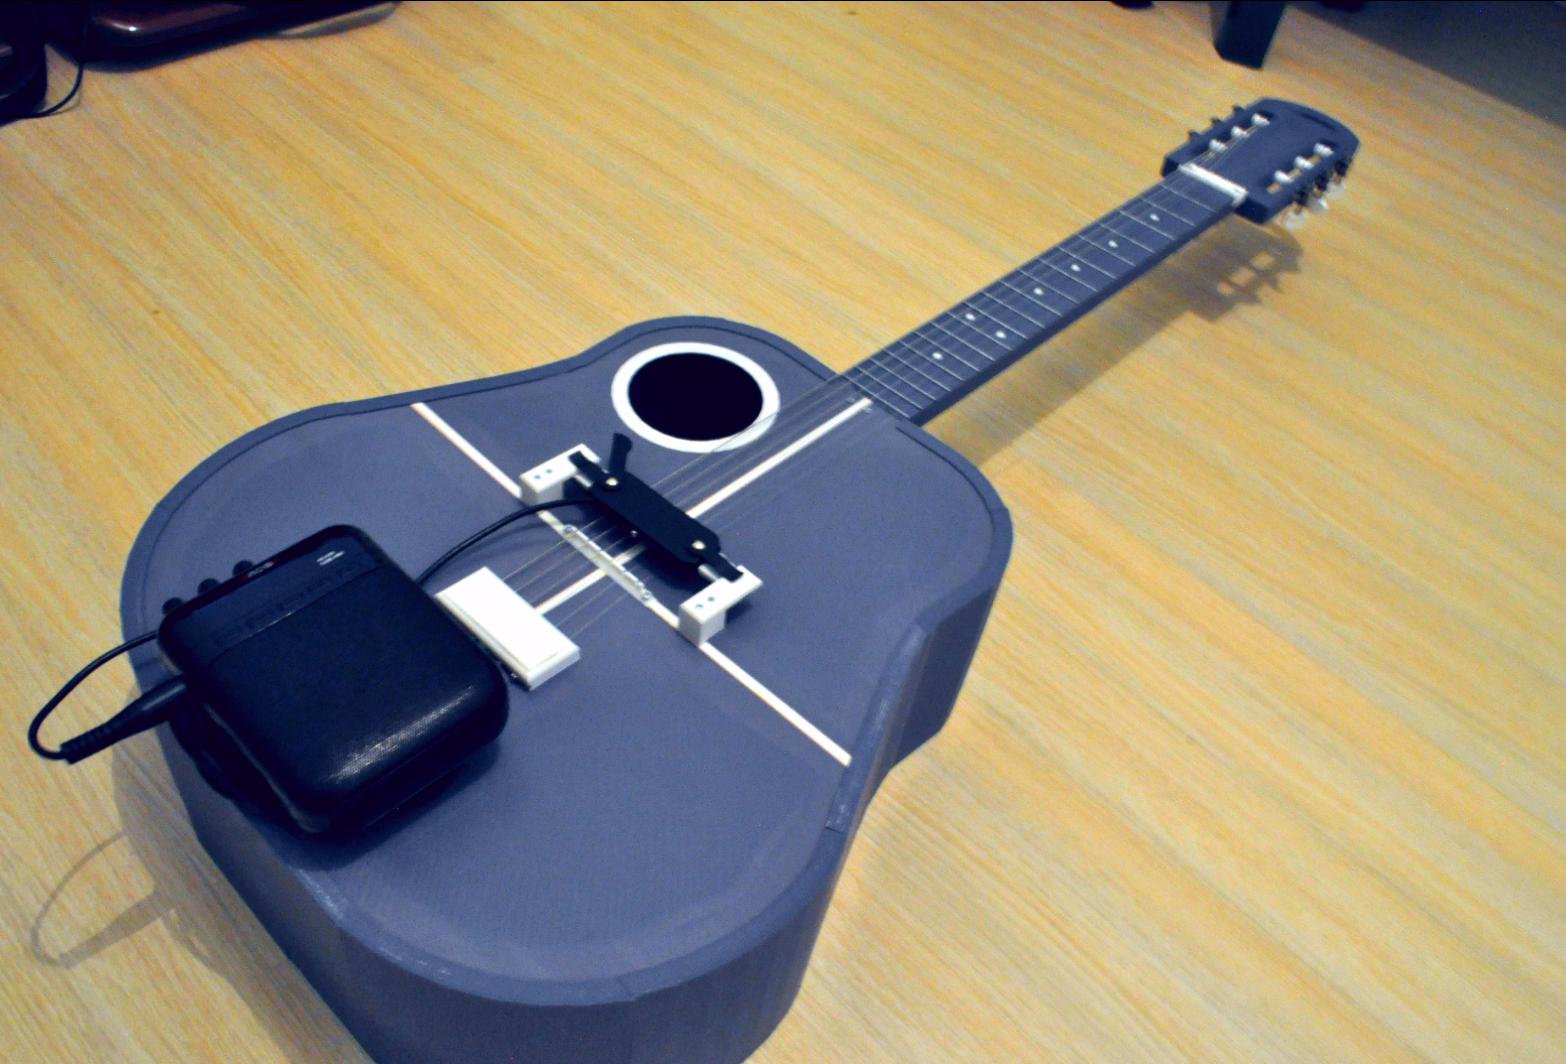 4.png Download free STL file Acoustic guitar with AROMA AG-03M amplifier • 3D printer model, CrocodileGene3d